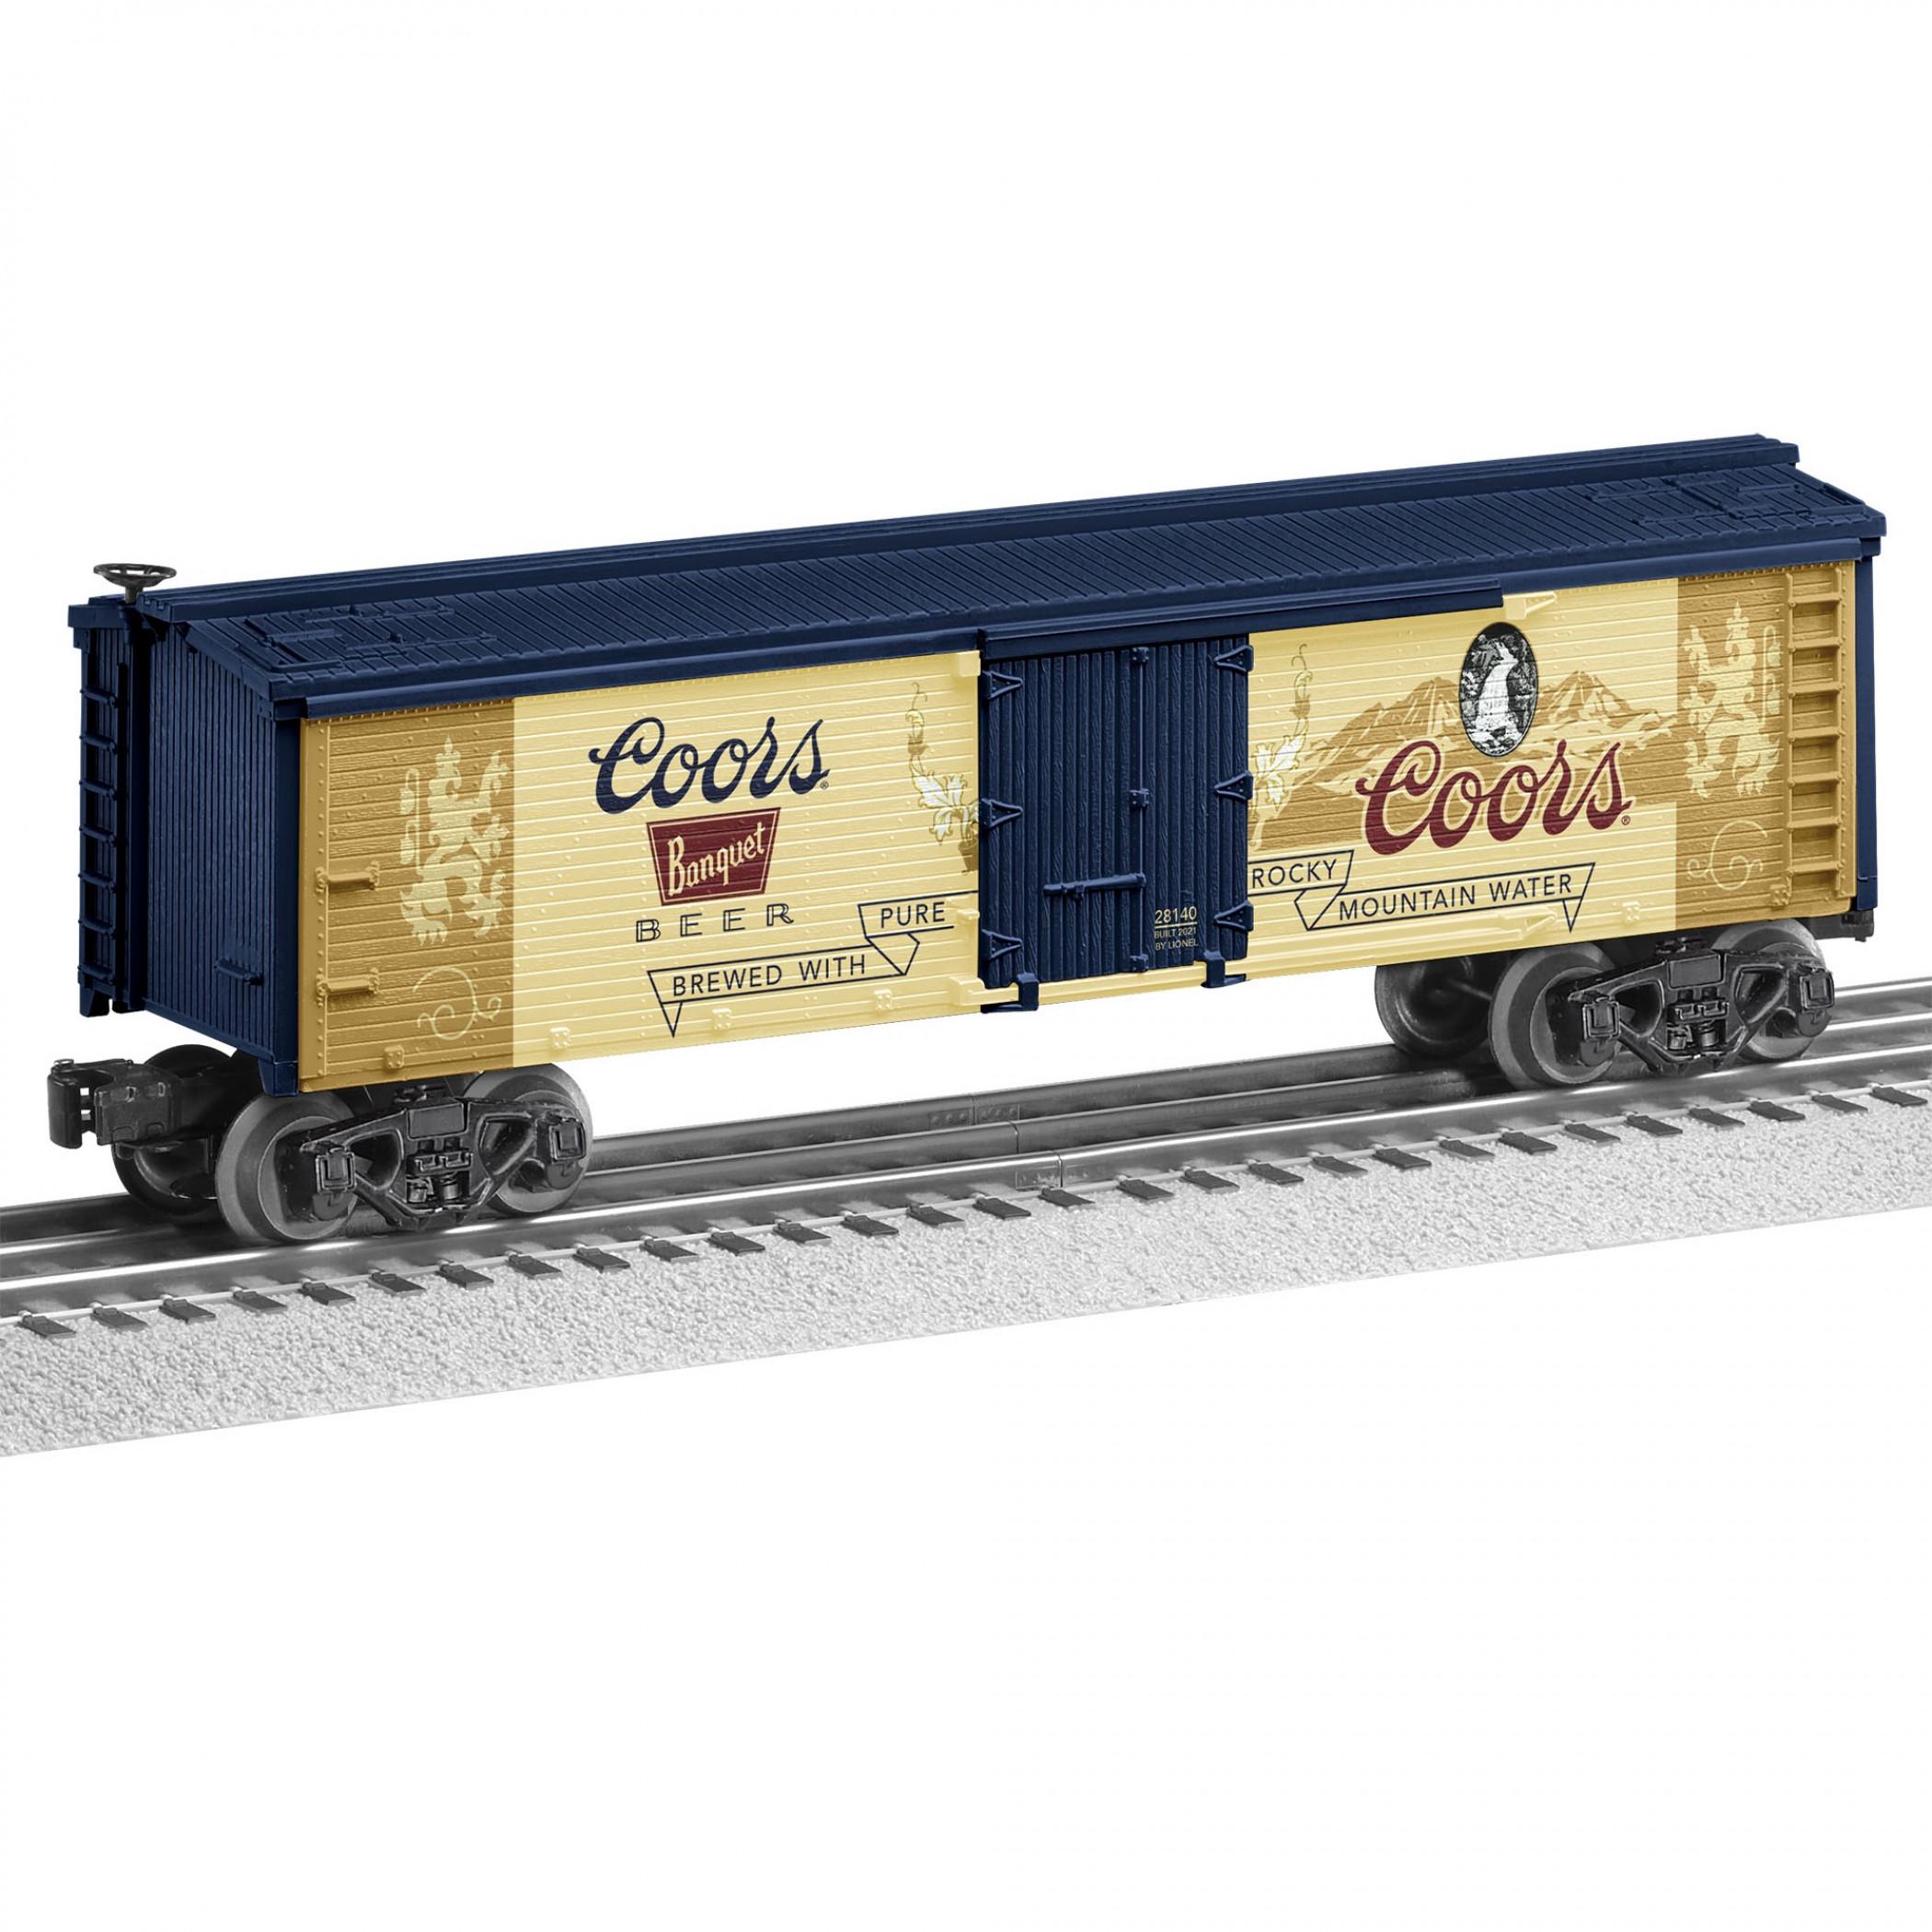 Vintage Coors Banquet Reefer Train Car